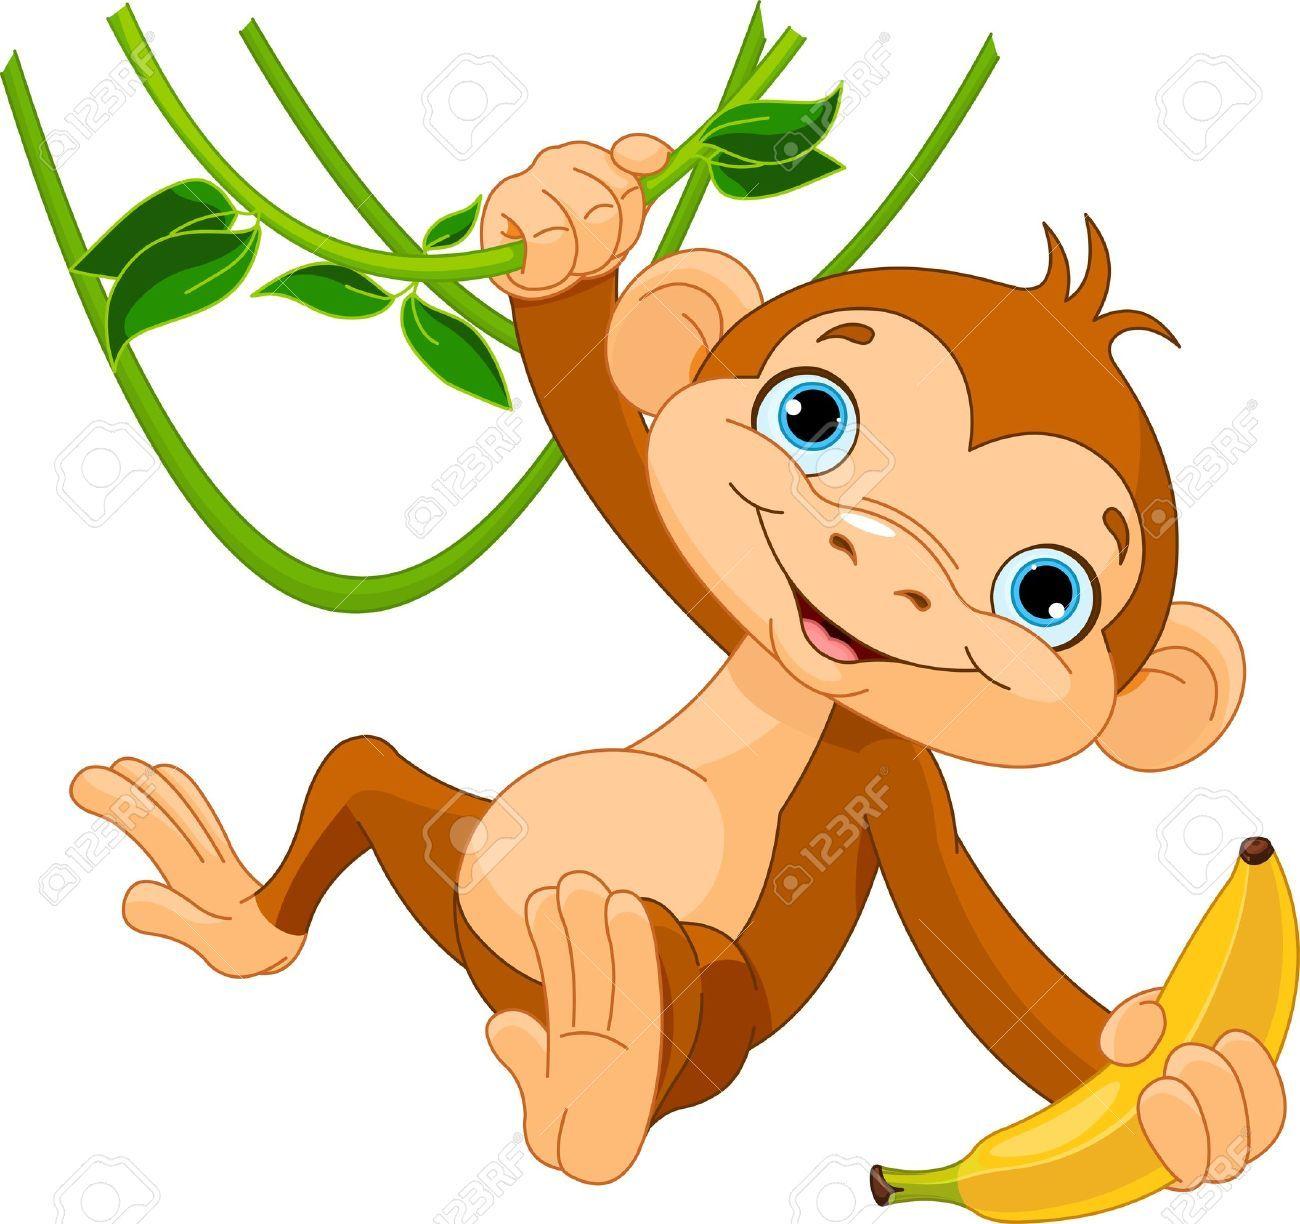 Monkey banana clipart 7 » Clipart Portal.